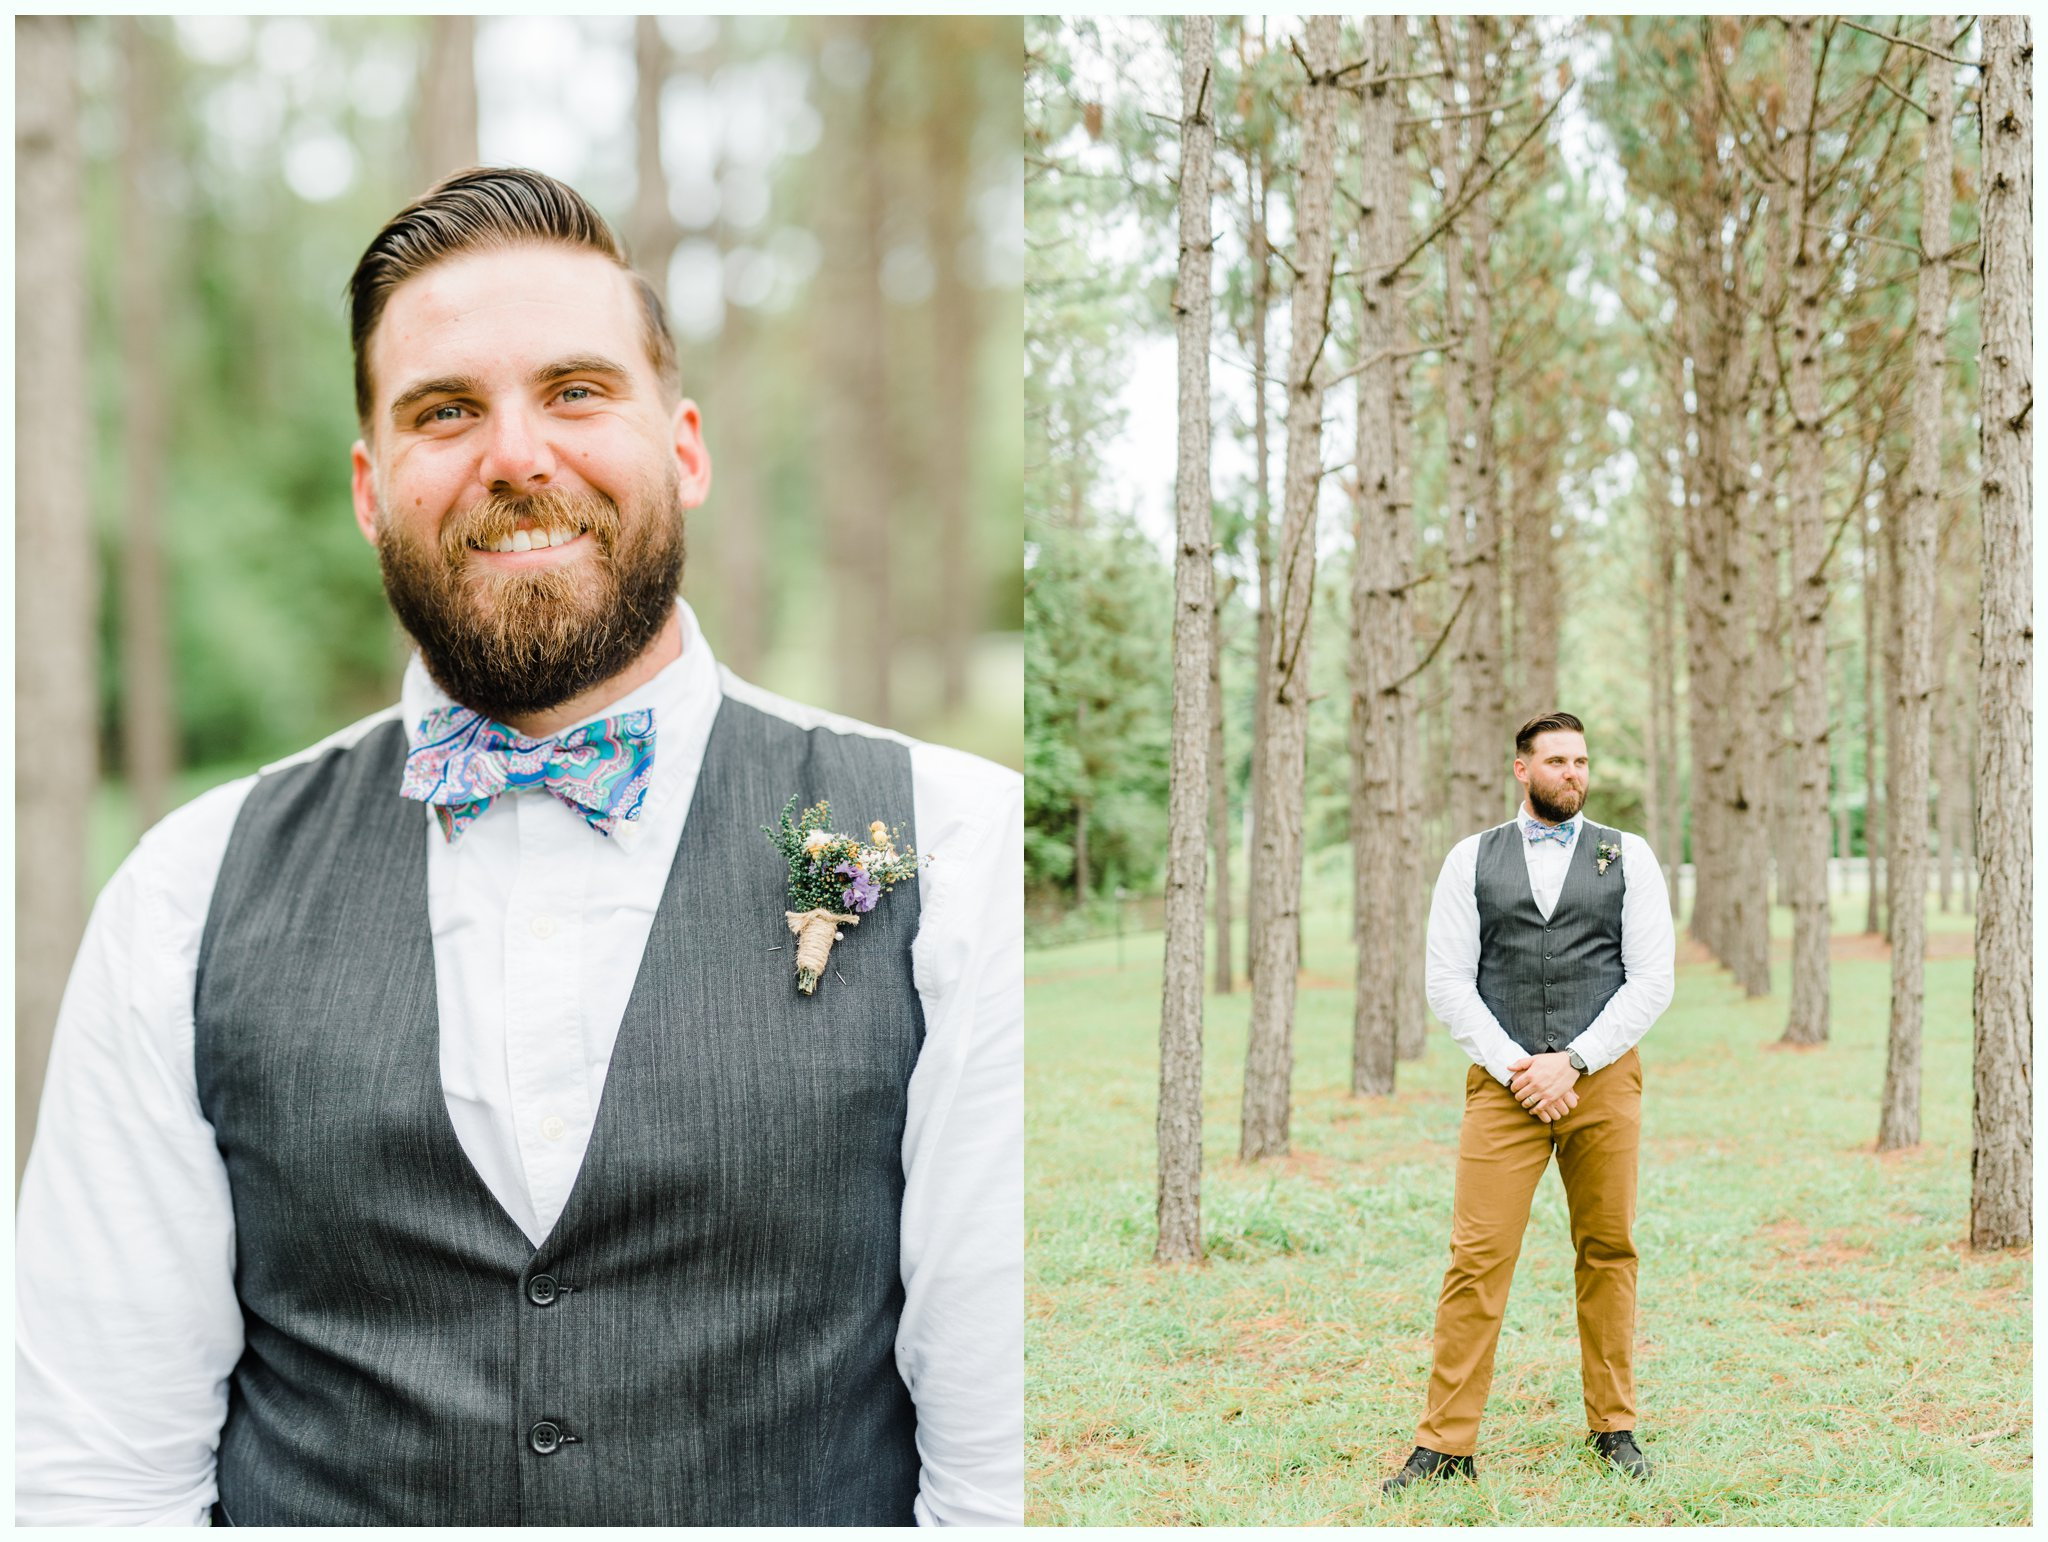 Jake&rhondawedding_5232.jpg